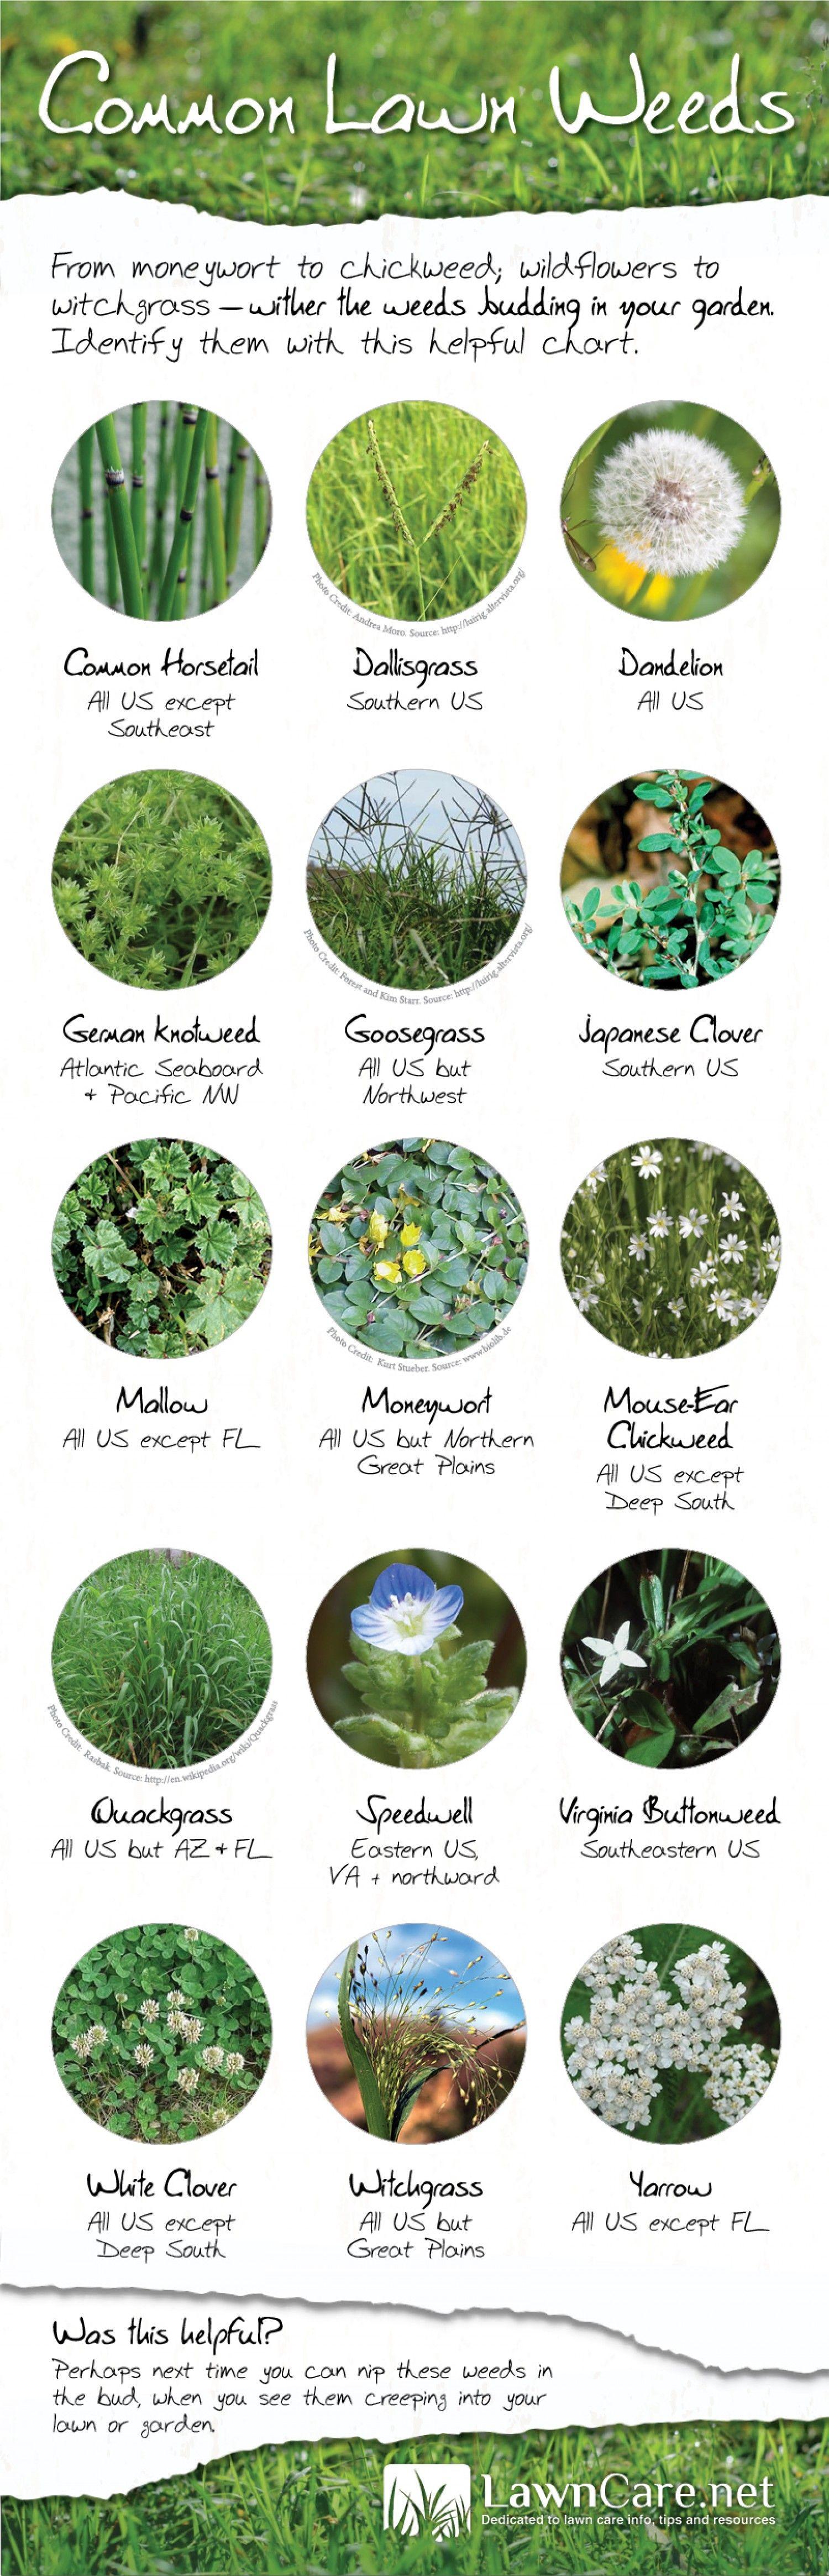 Common lawn weeds visual gardens u plants pinterest lawn